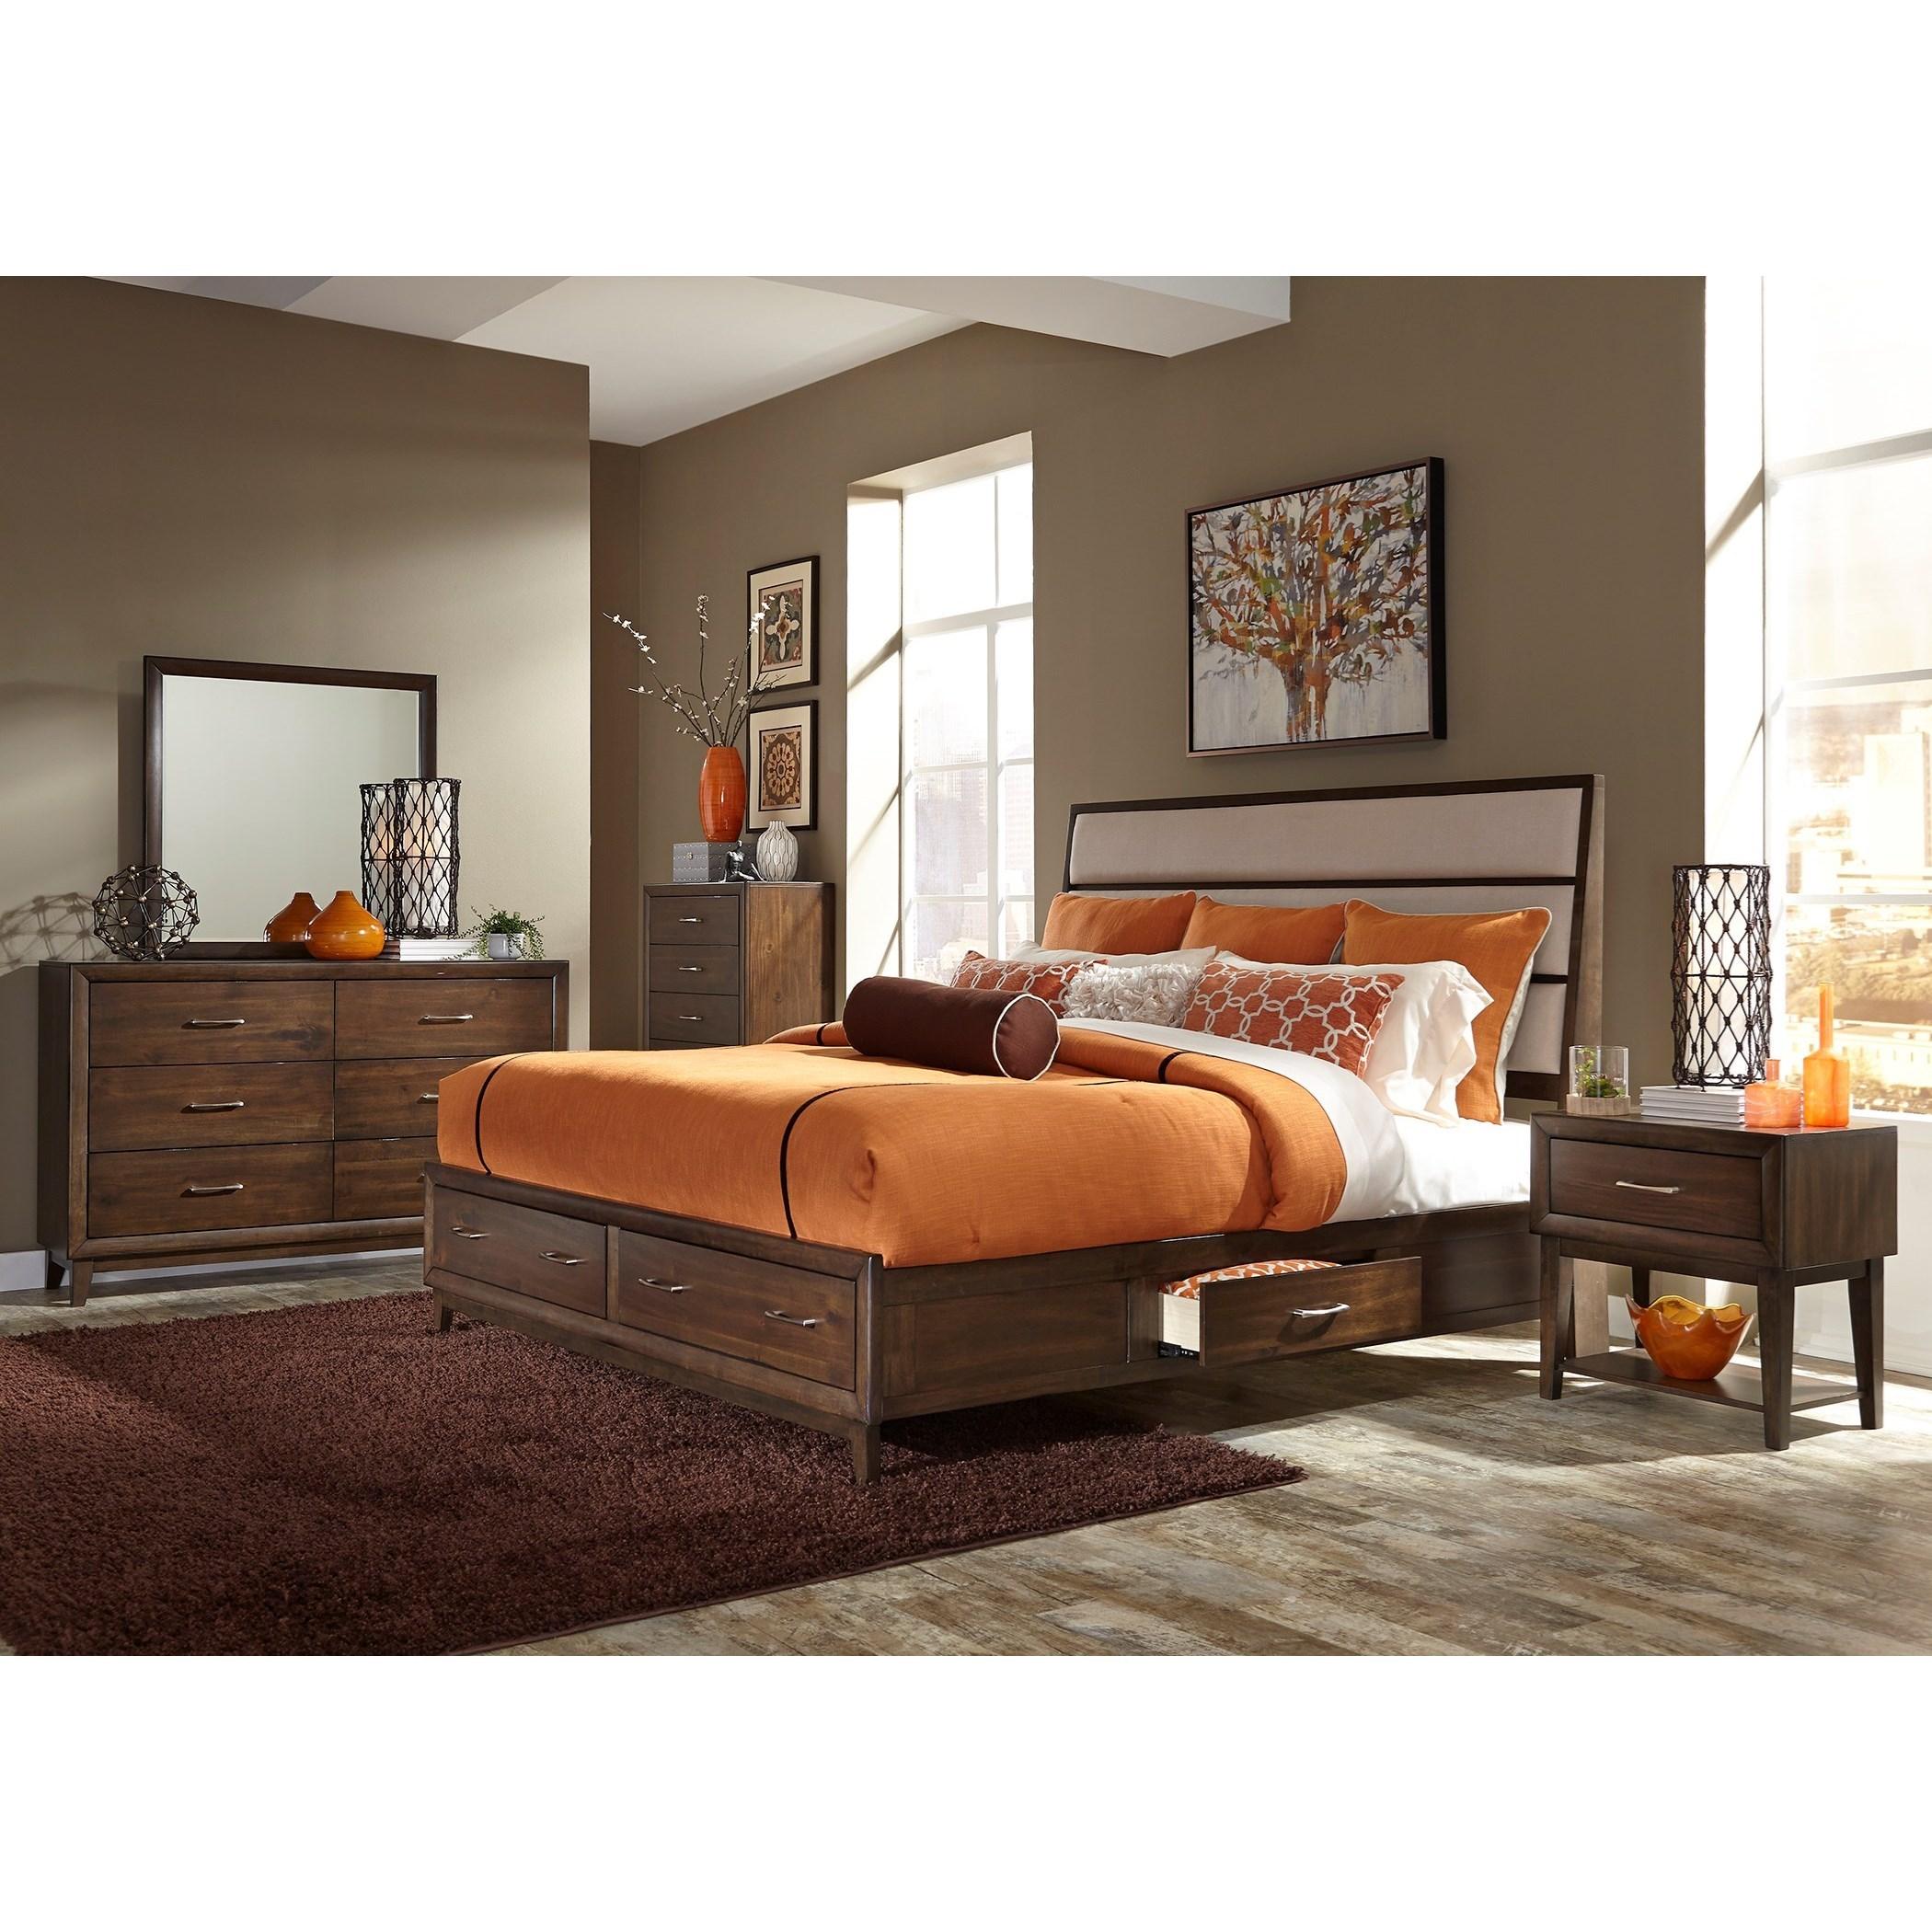 Liberty Furniture Hudson Square Bedroom Queen Bedroom Group - Item Number: 365-BR-Q2SDMCN